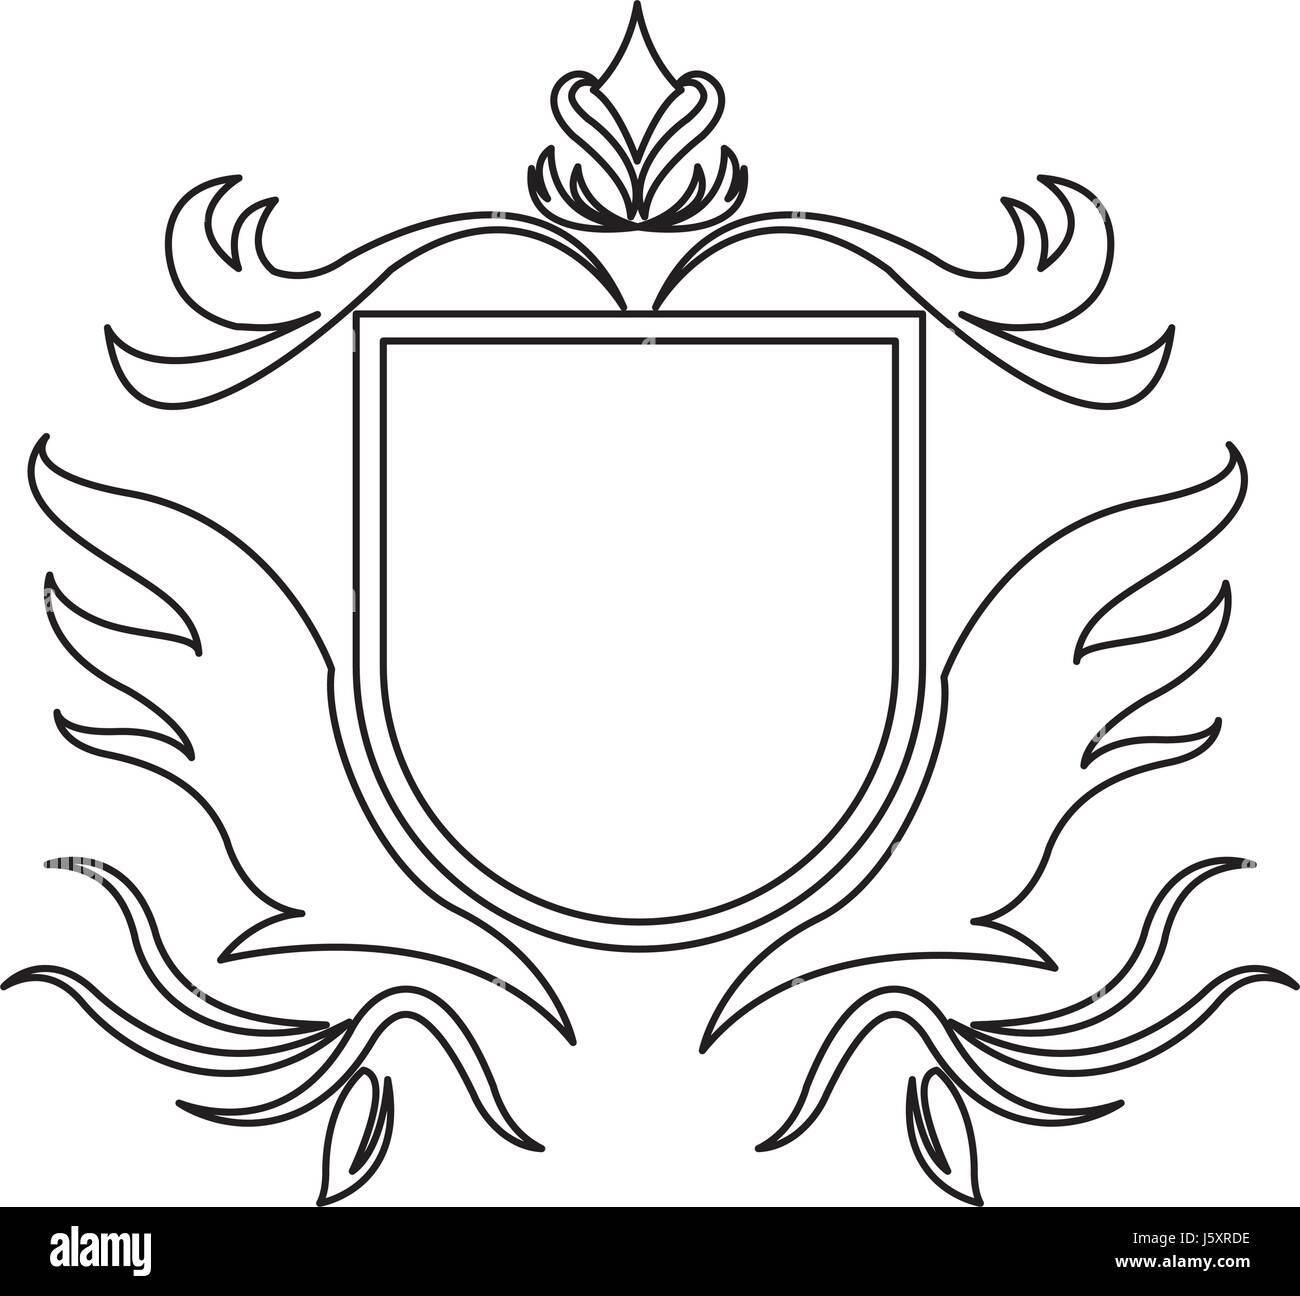 Mdina Glass Christmas Decorations: Baroque Shield Stock Photos & Baroque Shield Stock Images